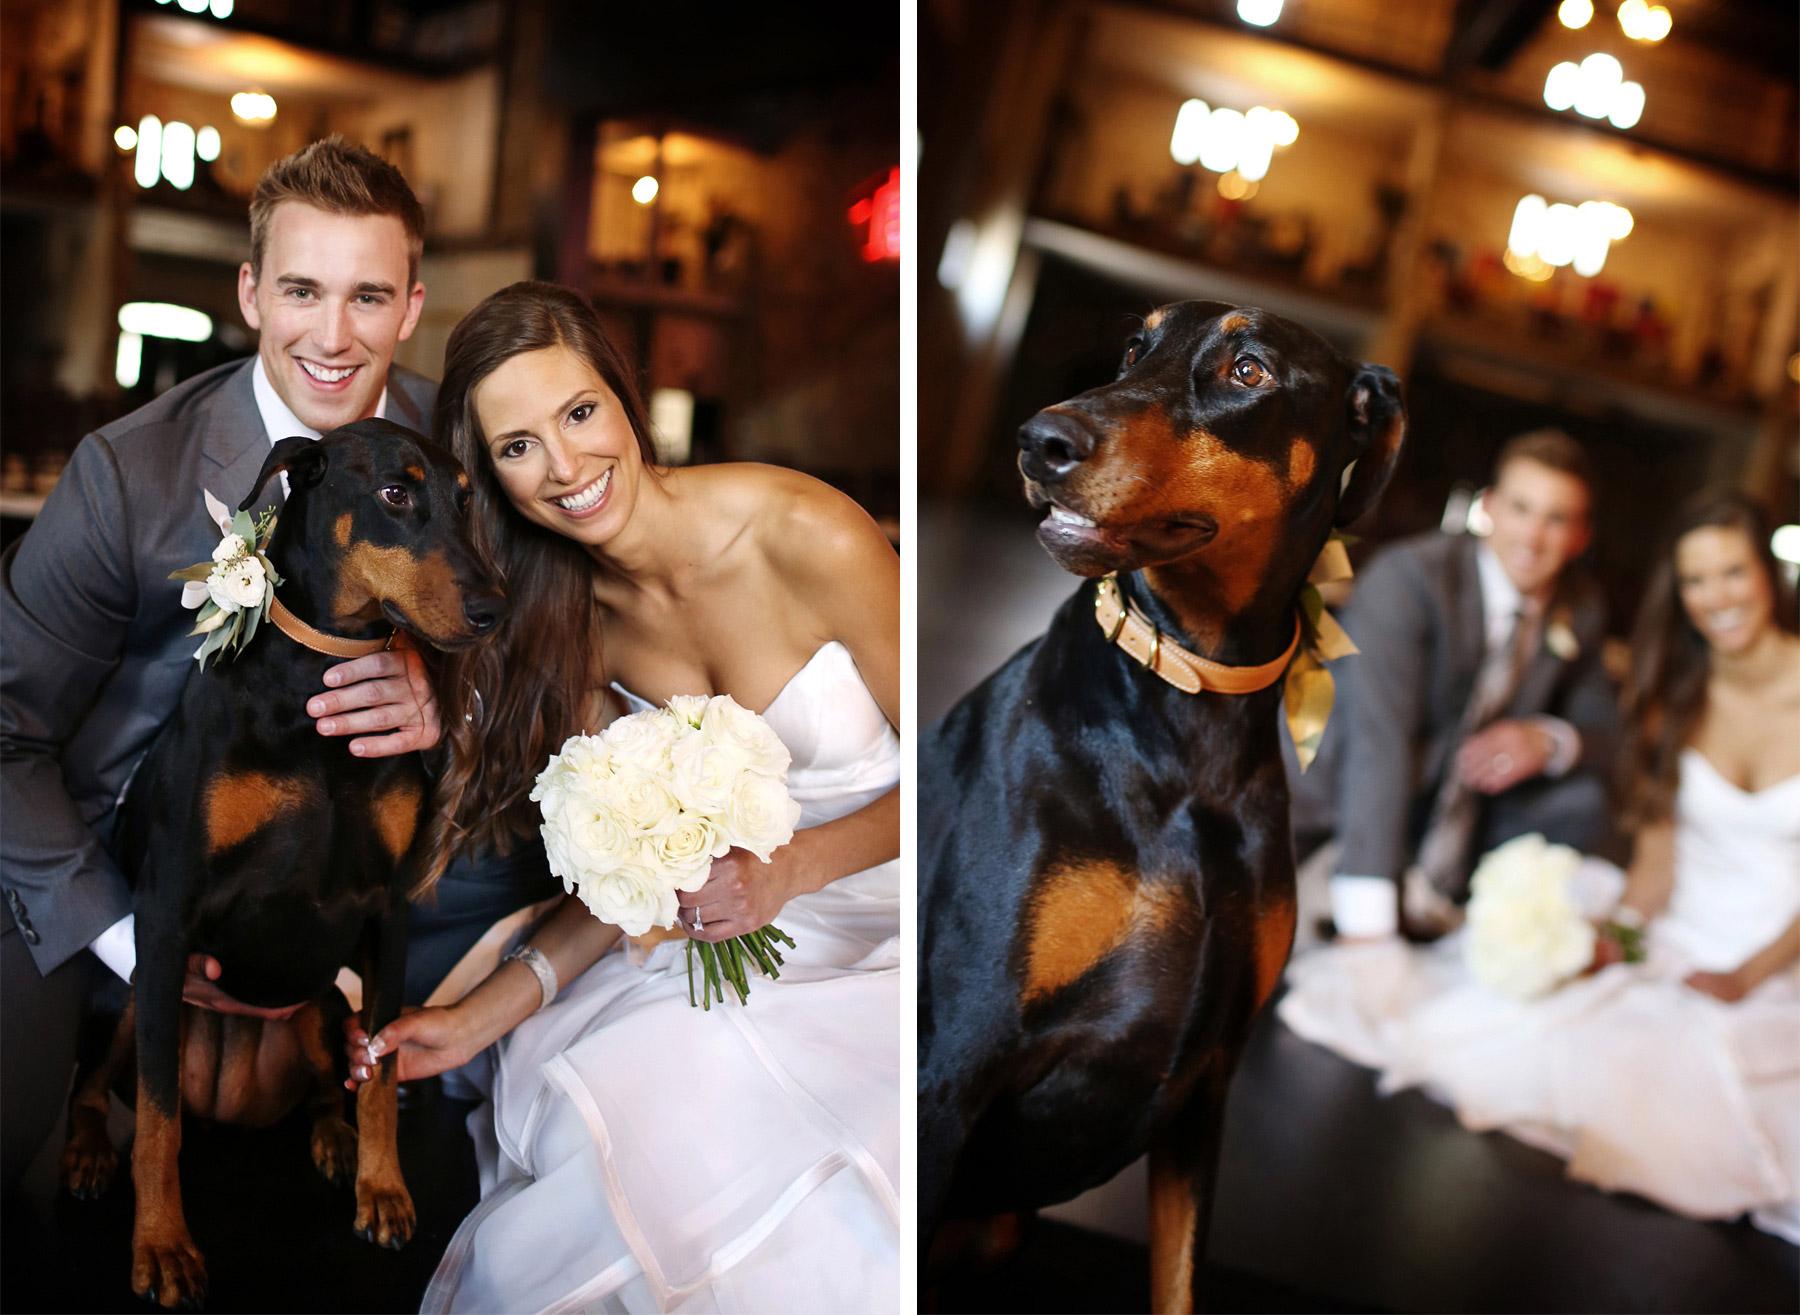 05-Minneapolis-Minnesota-Wedding-Photography-by-Vick-Photography-Aria-Dog-Portrait-Katie-&-Joe.jpg